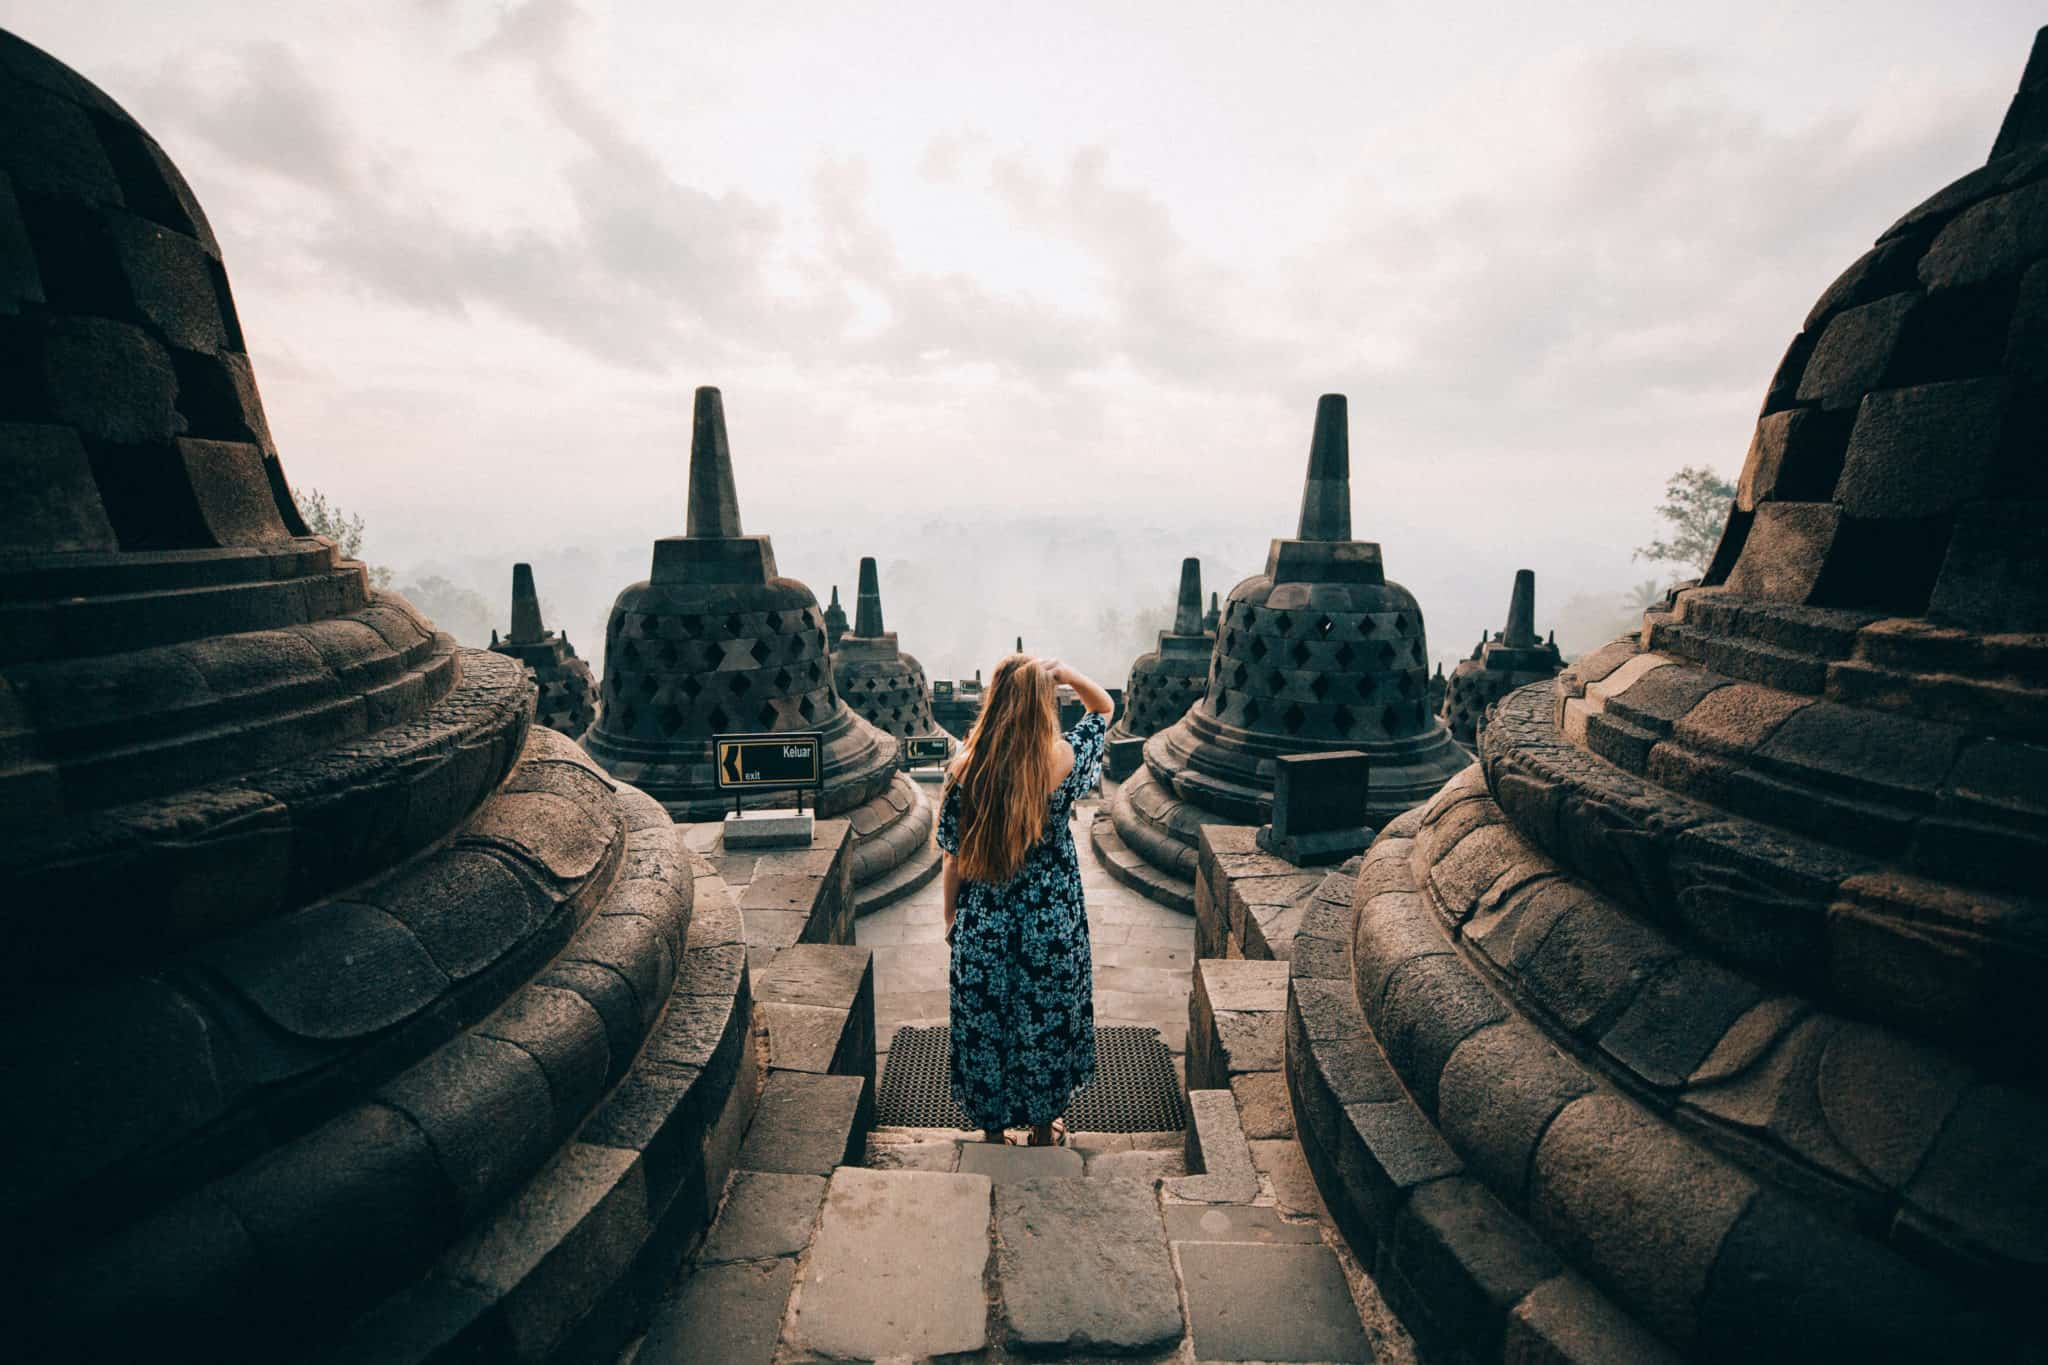 Intip Kejayaan Indonesia di Masa Lalu dari Tempat-tempat Wisata Sejarah Berikut Ini 3